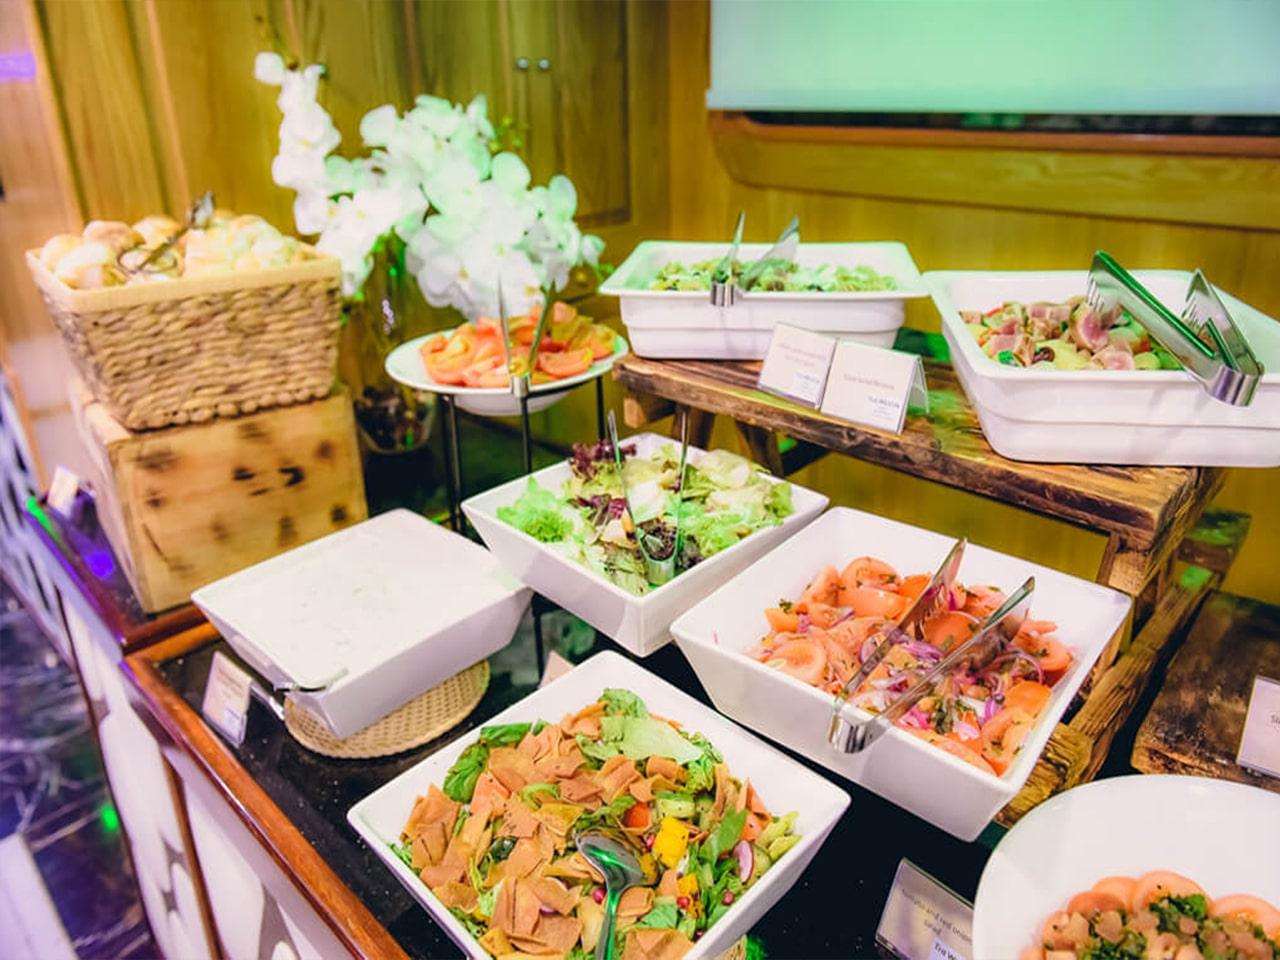 Lotus-Mega-Yacht-Cruise-Dinner-Dubai-Galery-6